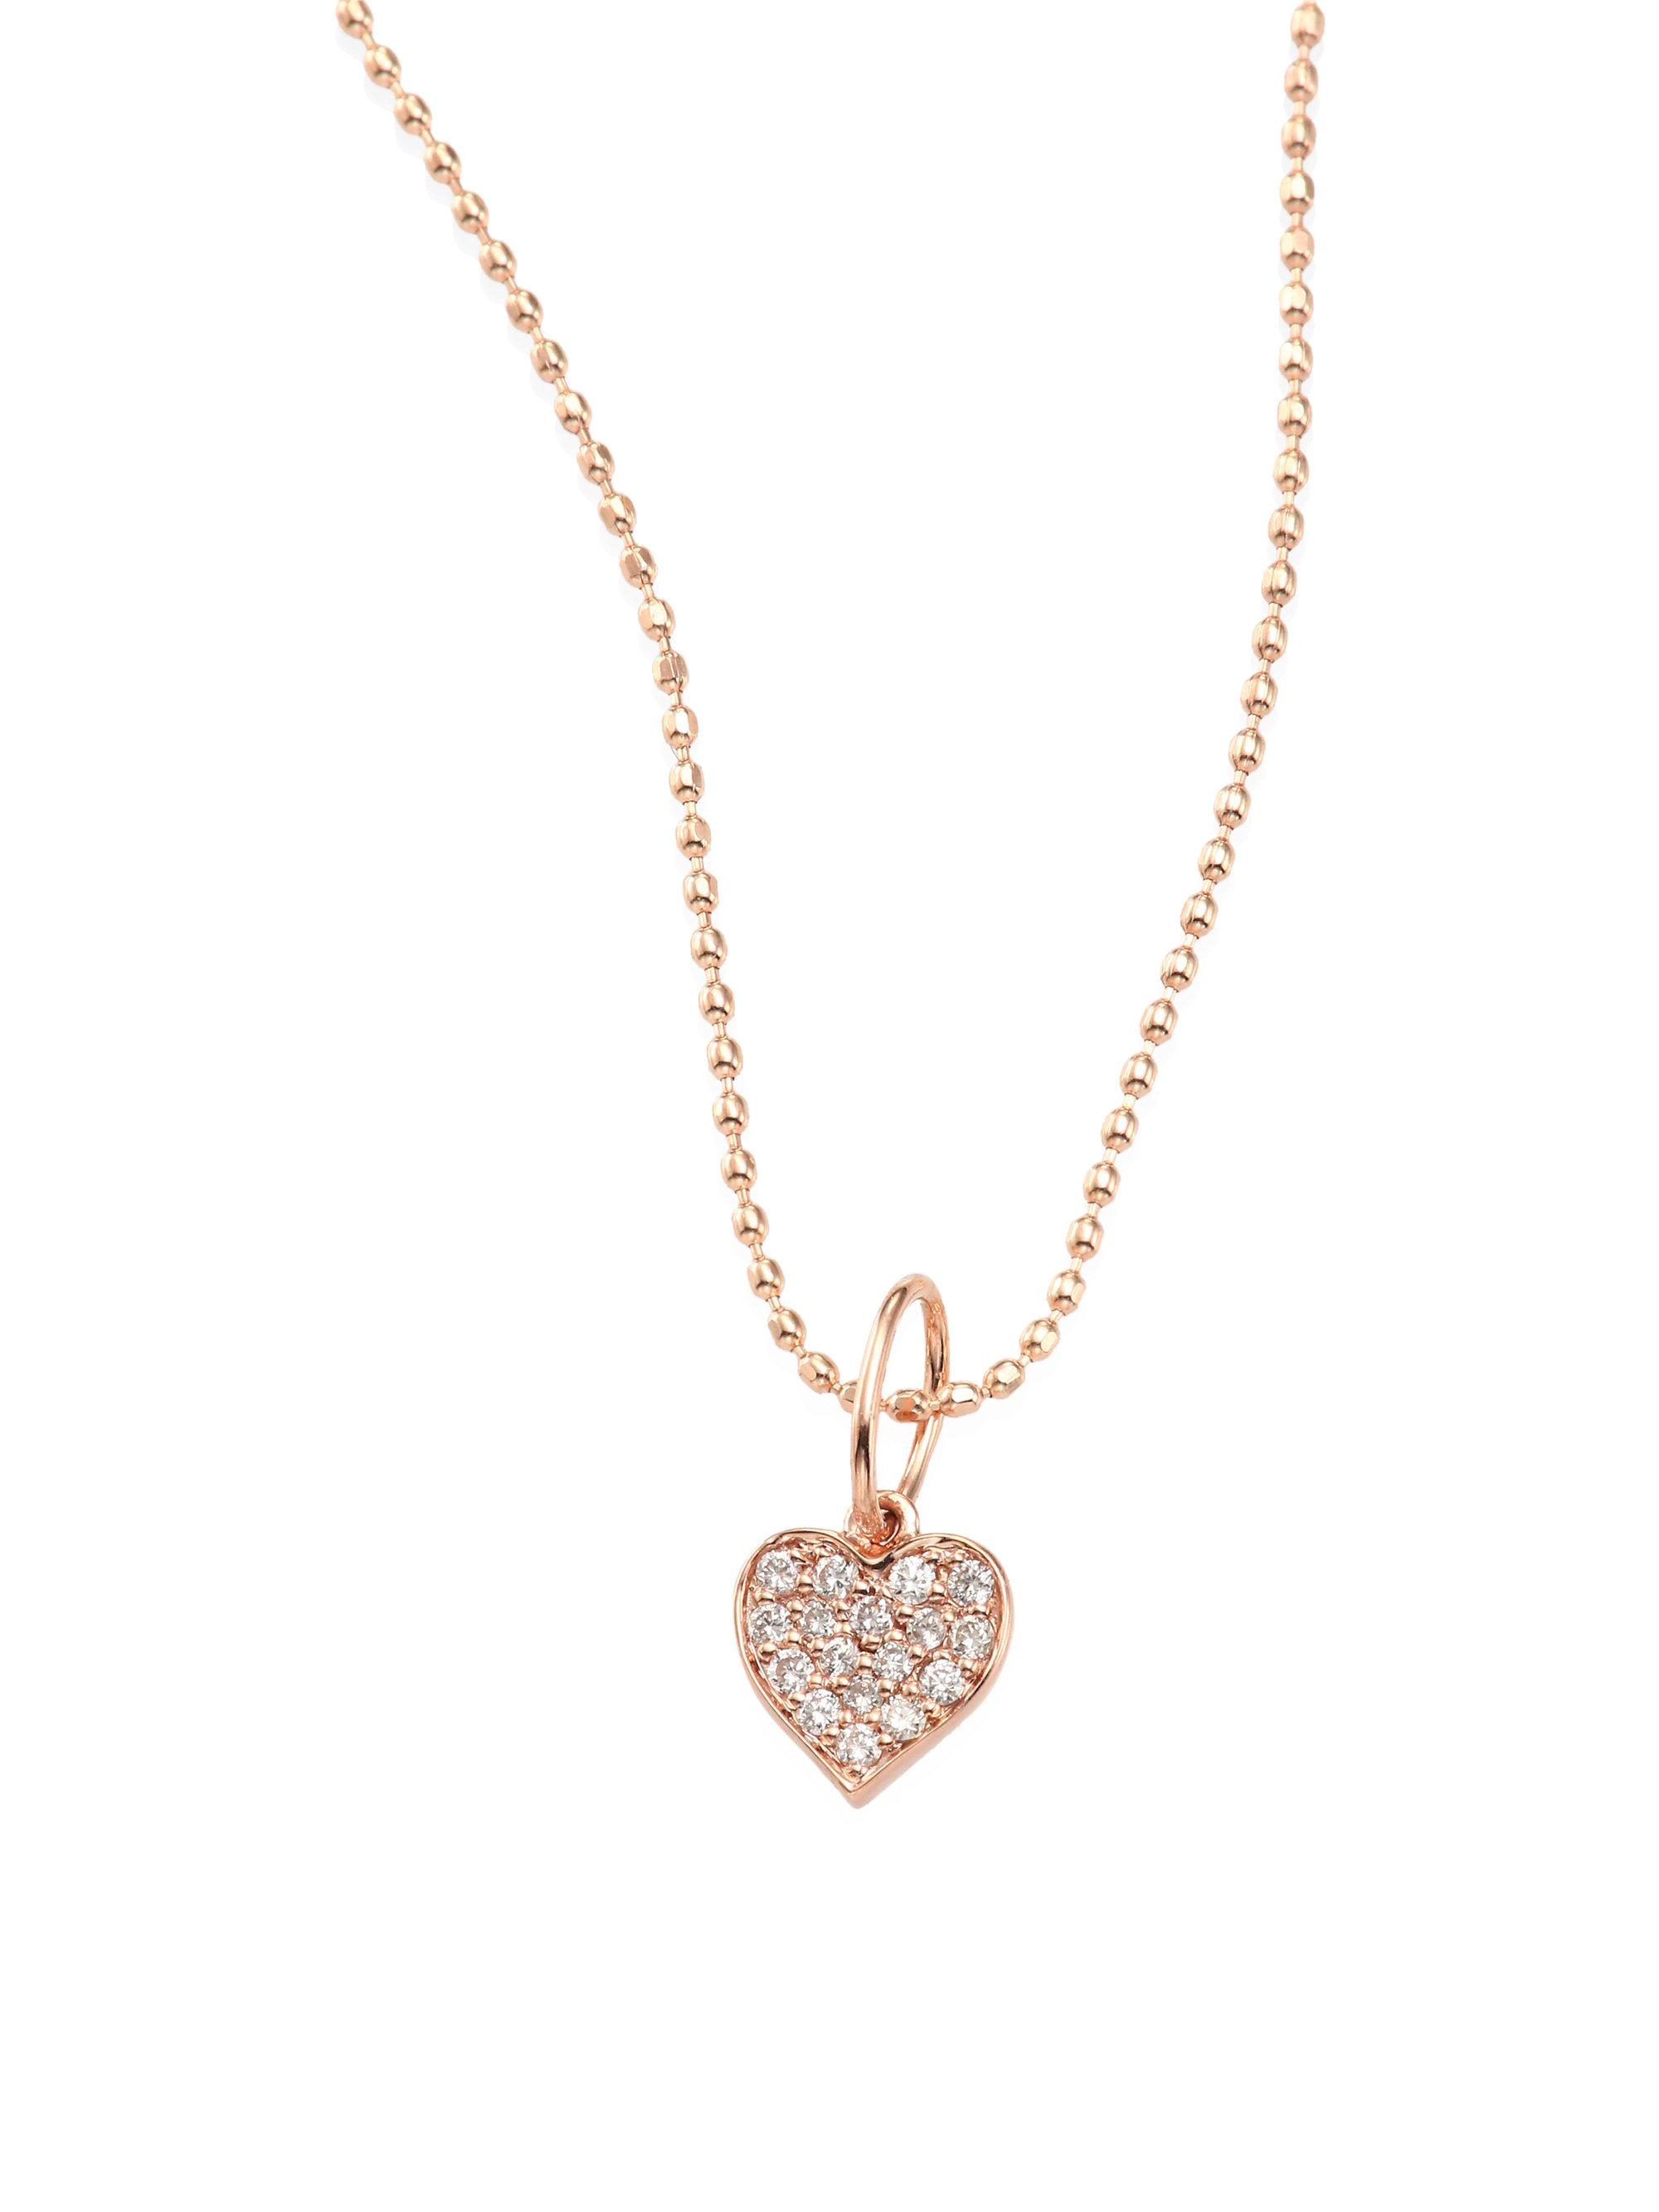 Sydney Evan 14k Diamond XO Pendant Necklace pknmw